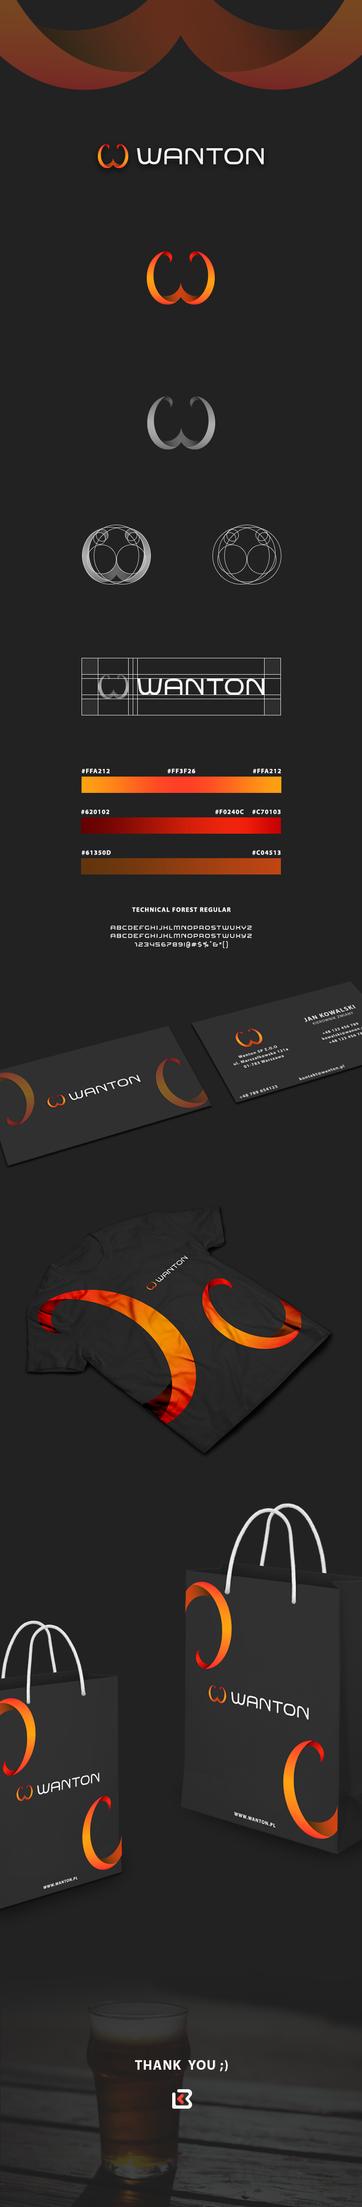 Wanton - Corporate Identity Concept by KamilBachanek